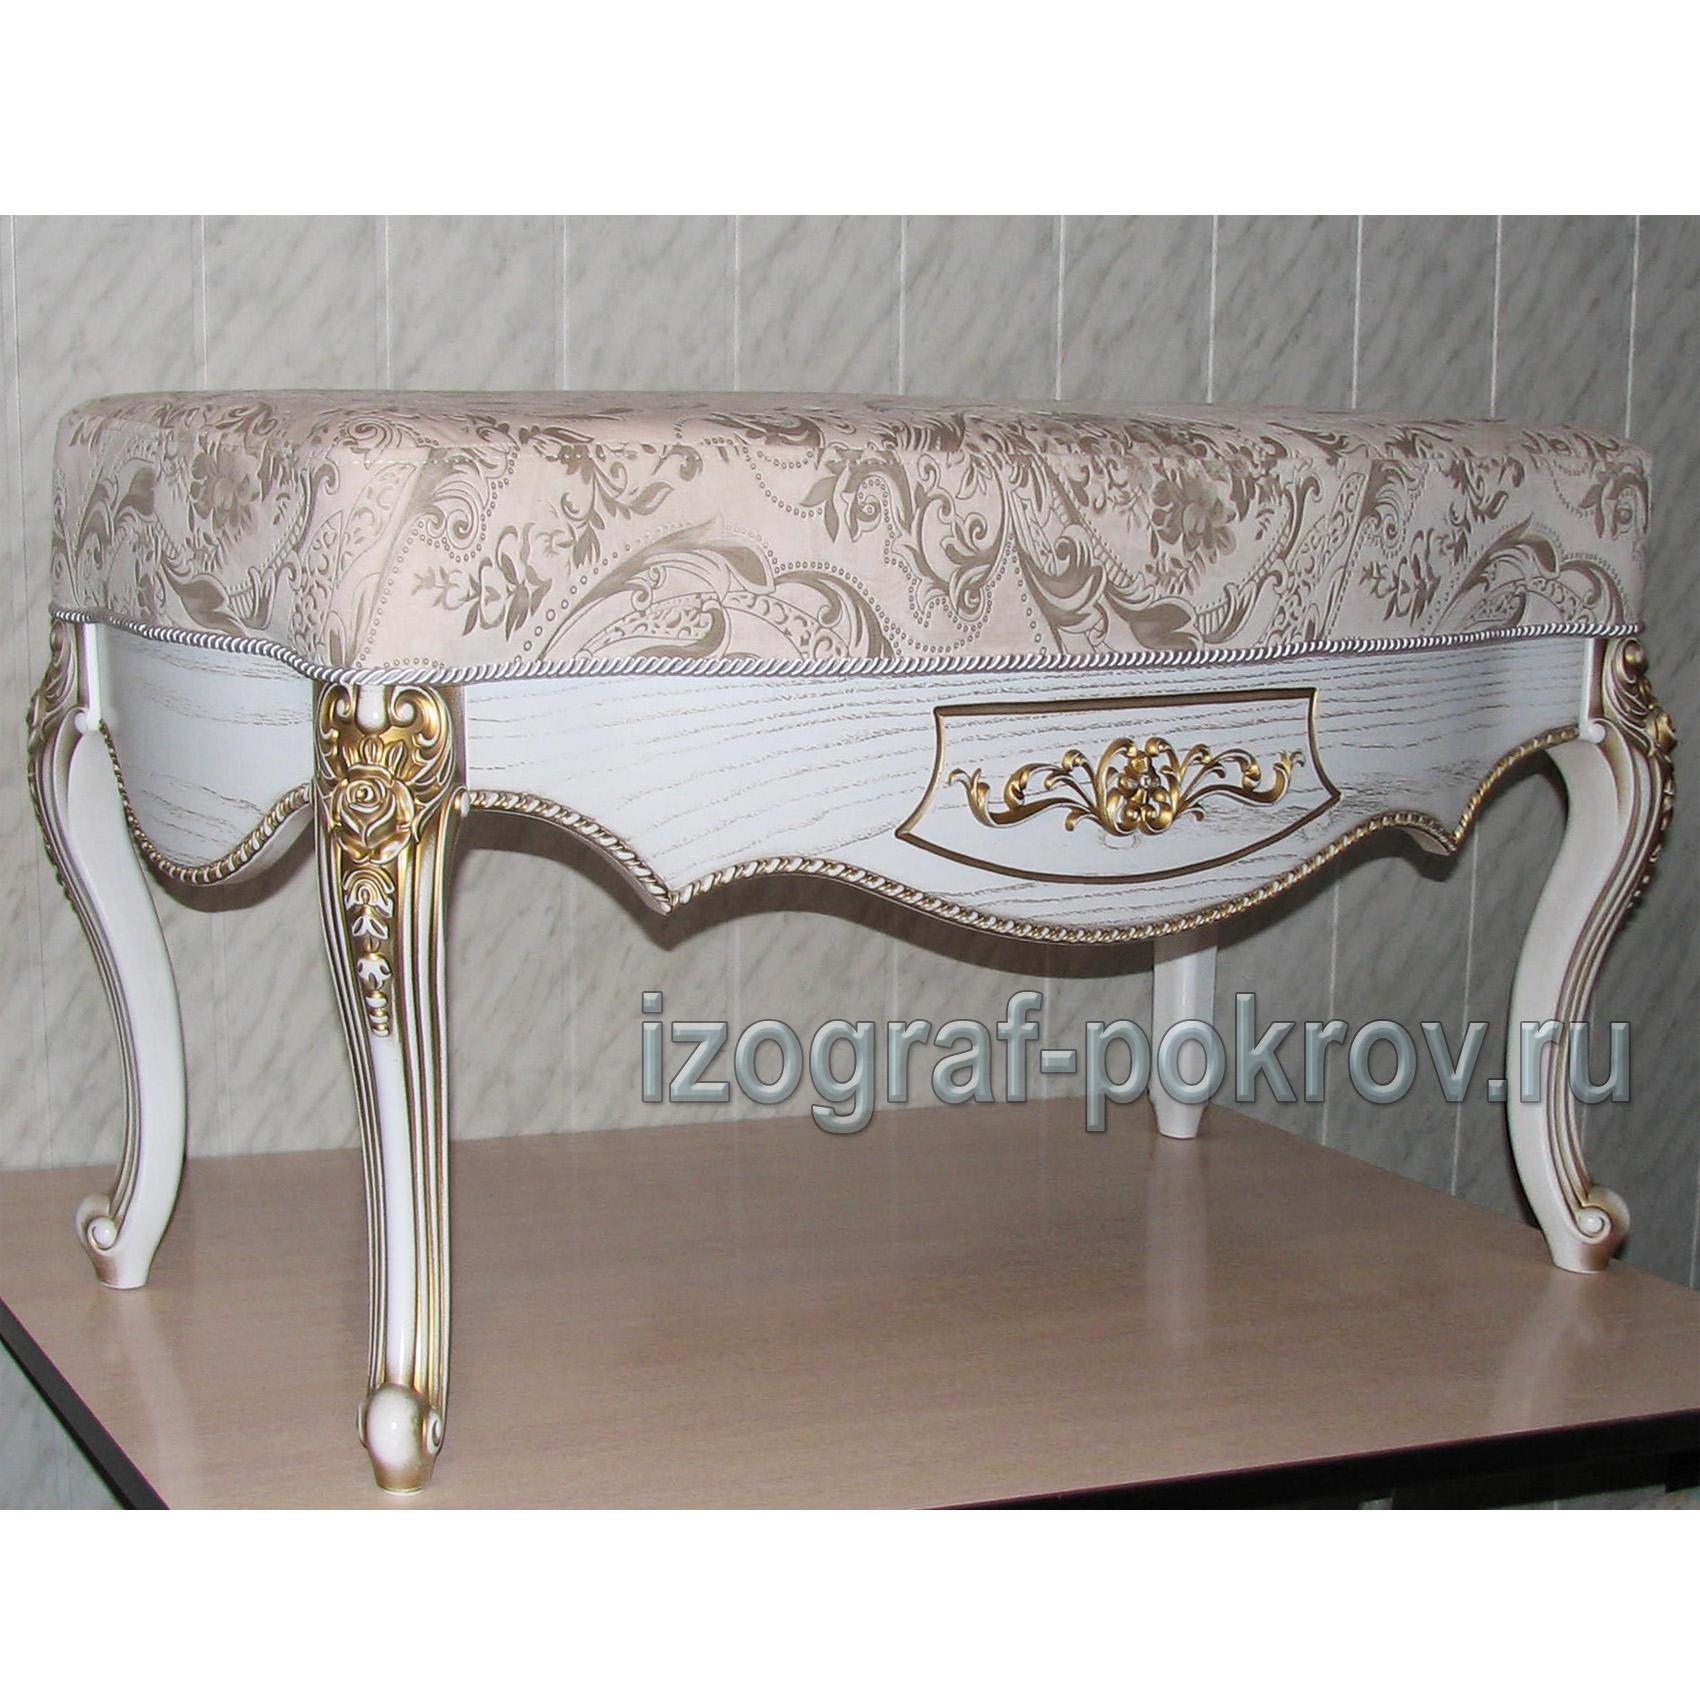 Банкетка для спальни белая вид сбоку под заказ